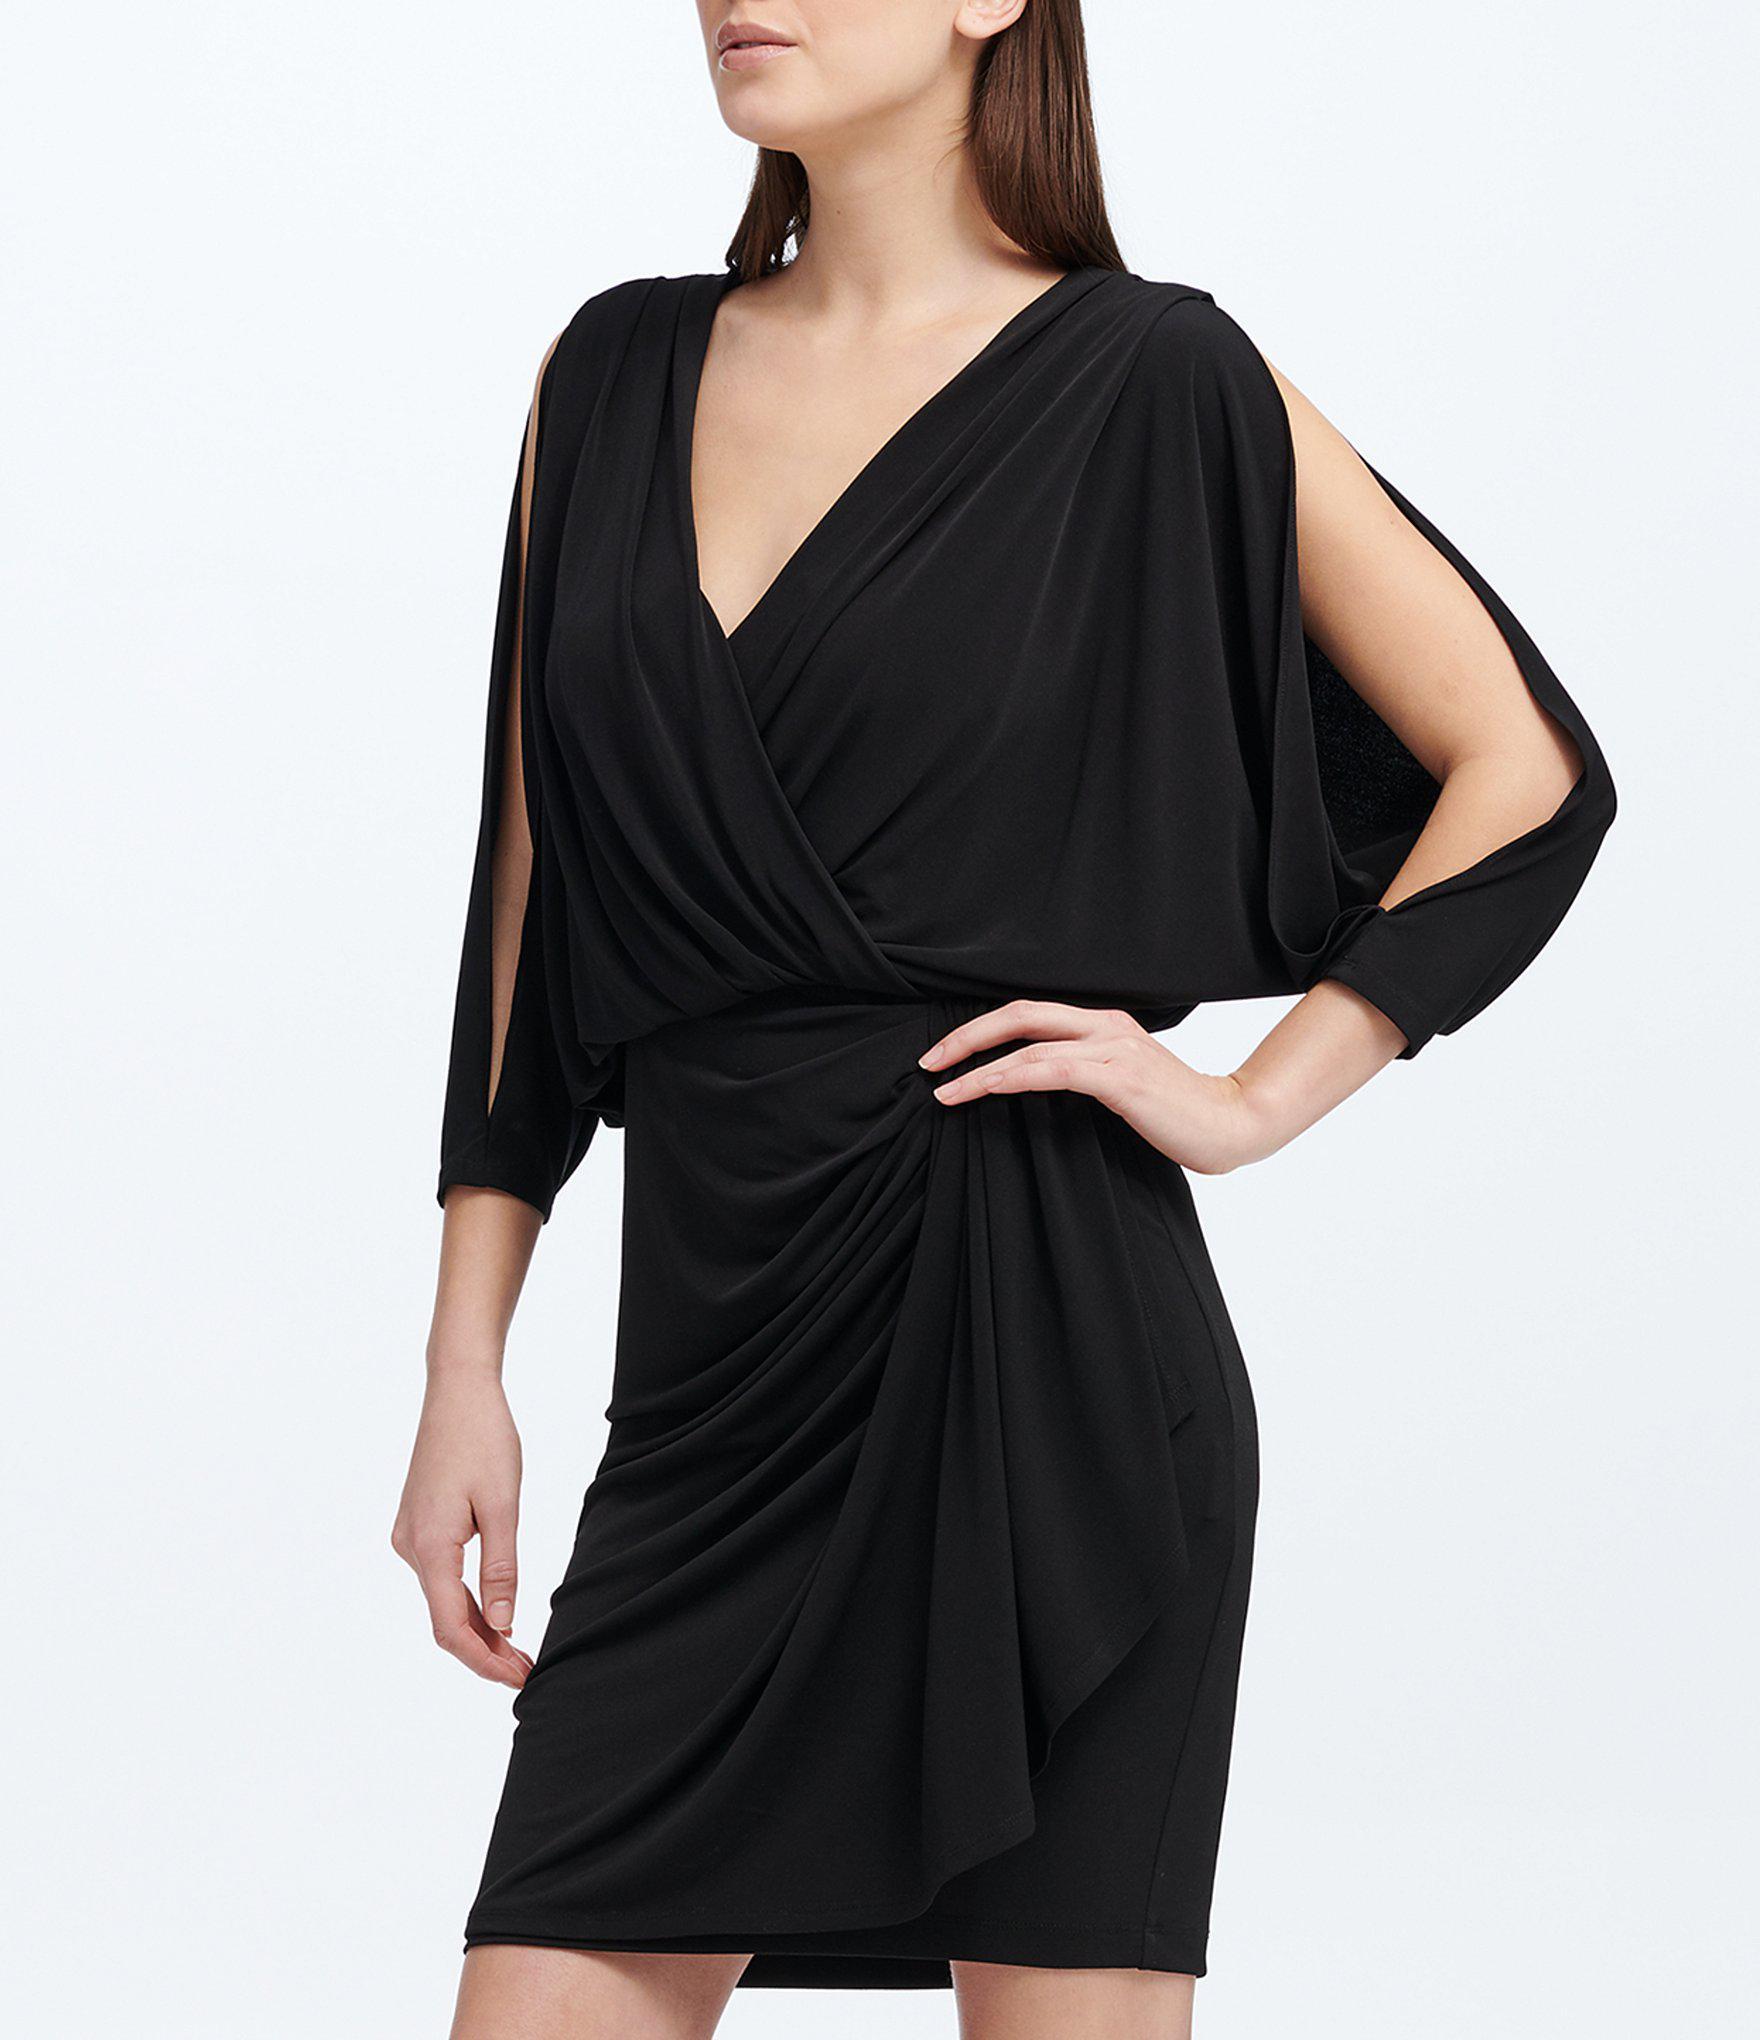 76b86ec47e Lyst - DKNY Donna Karan New York Faux Wrap Blouson Jersey Dress in Black